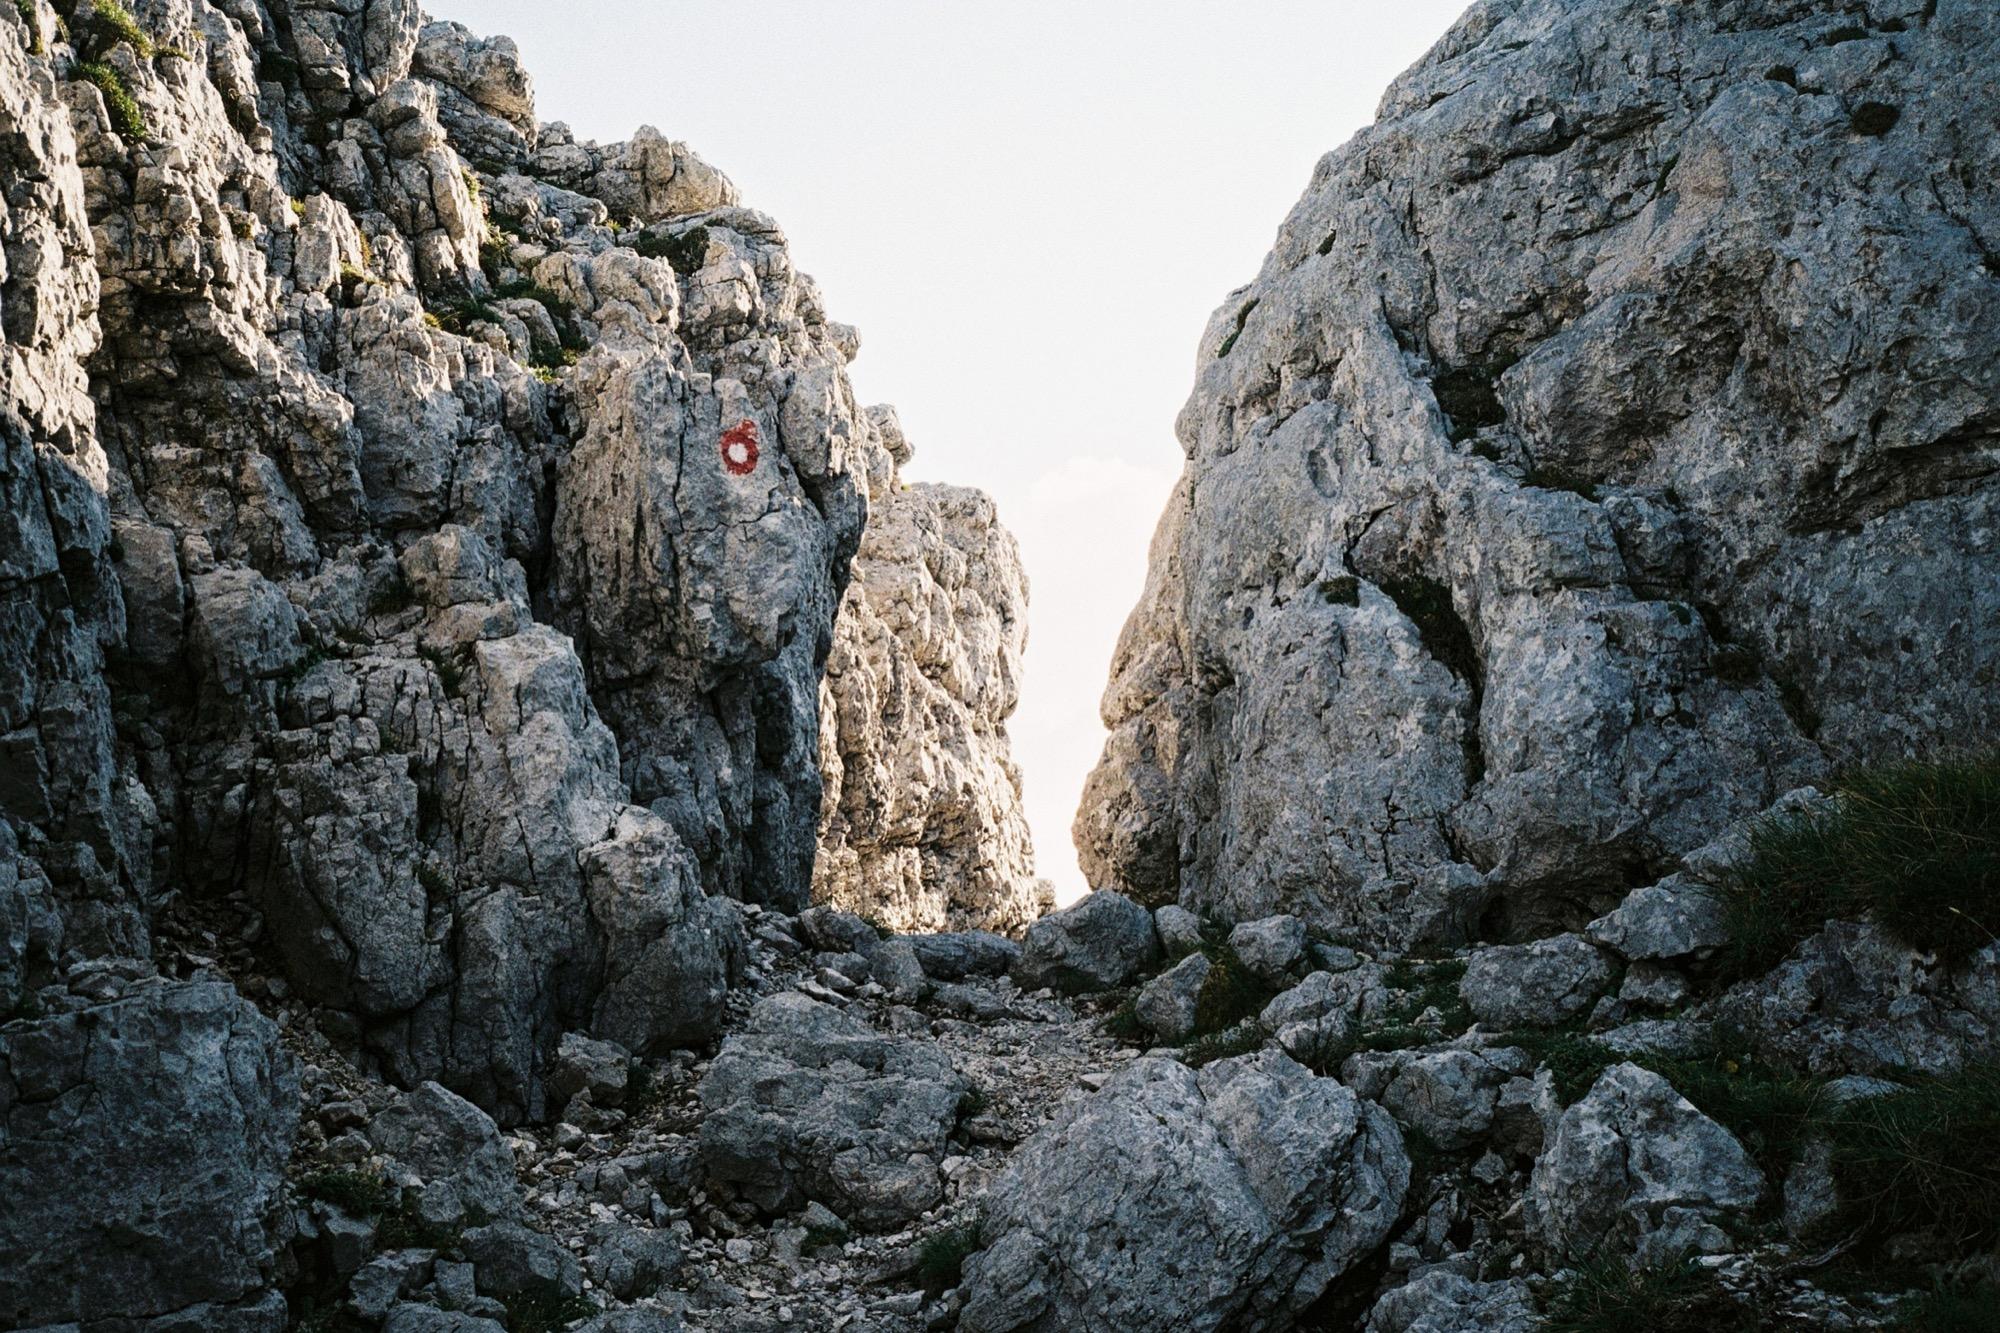 Passage leading to Bivak Pavla Kemperla / Photo by Jaka Bulc